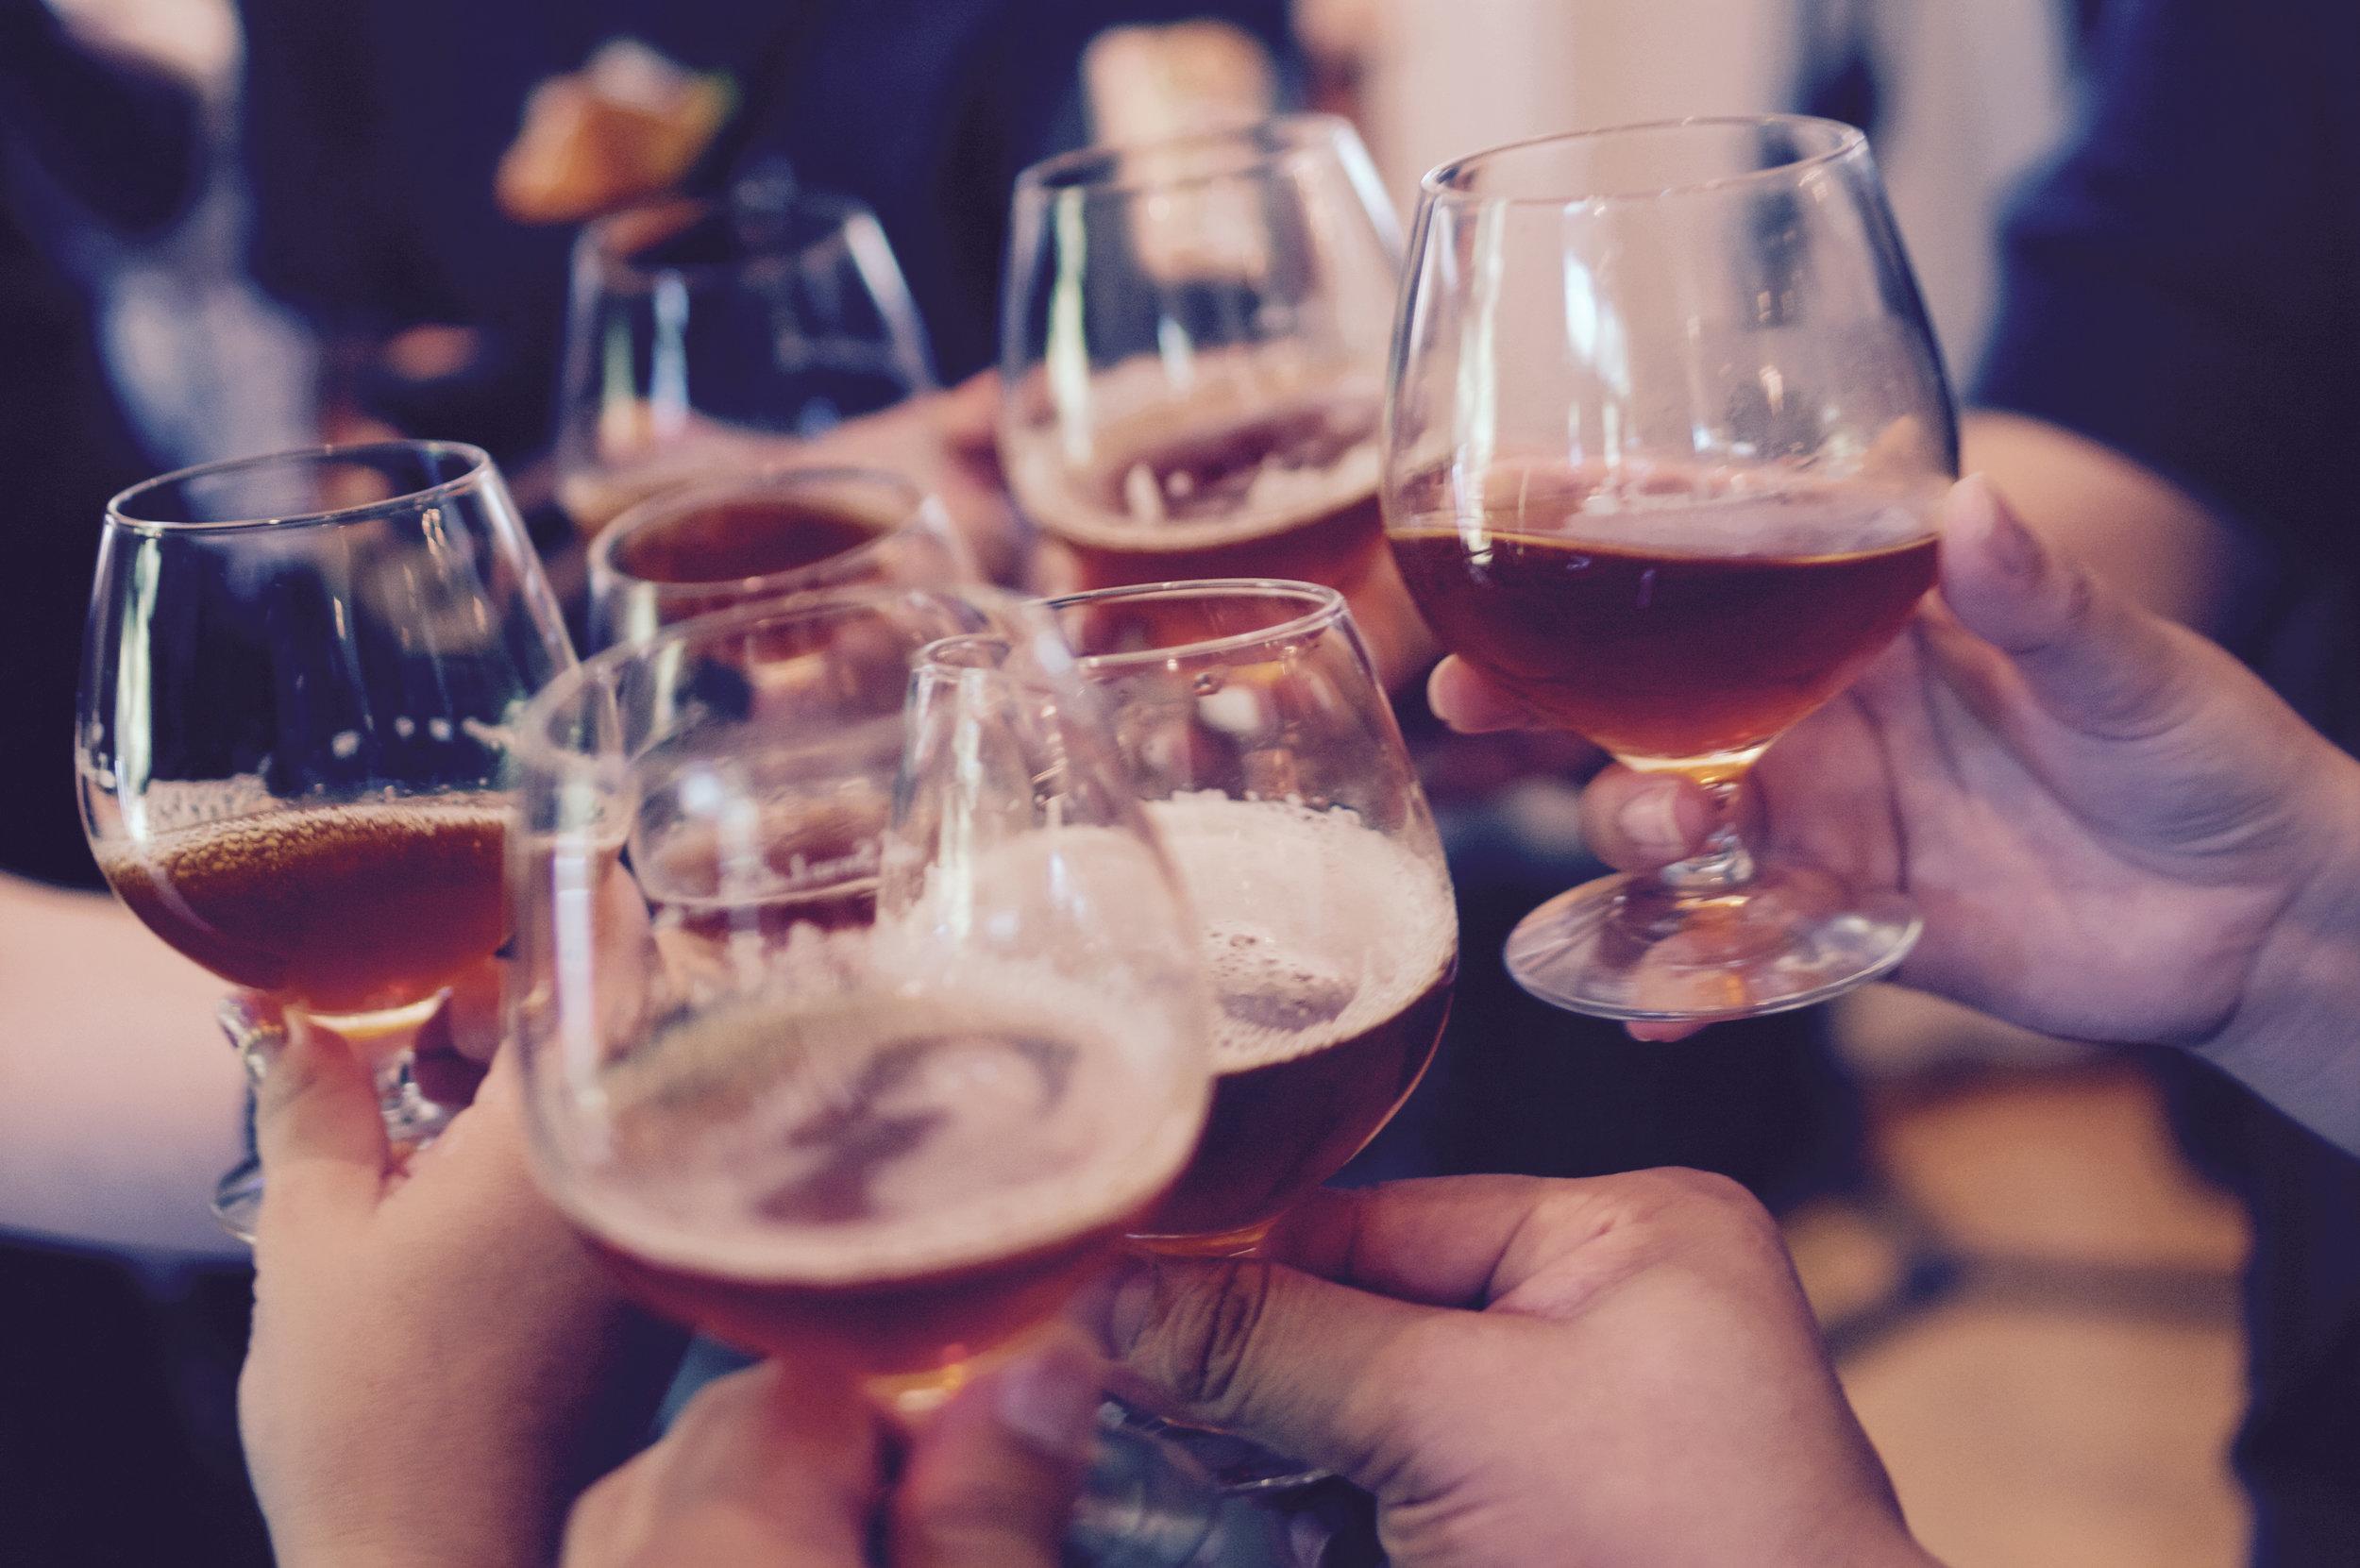 Bachelor Party planning by Unlock Las Vegas